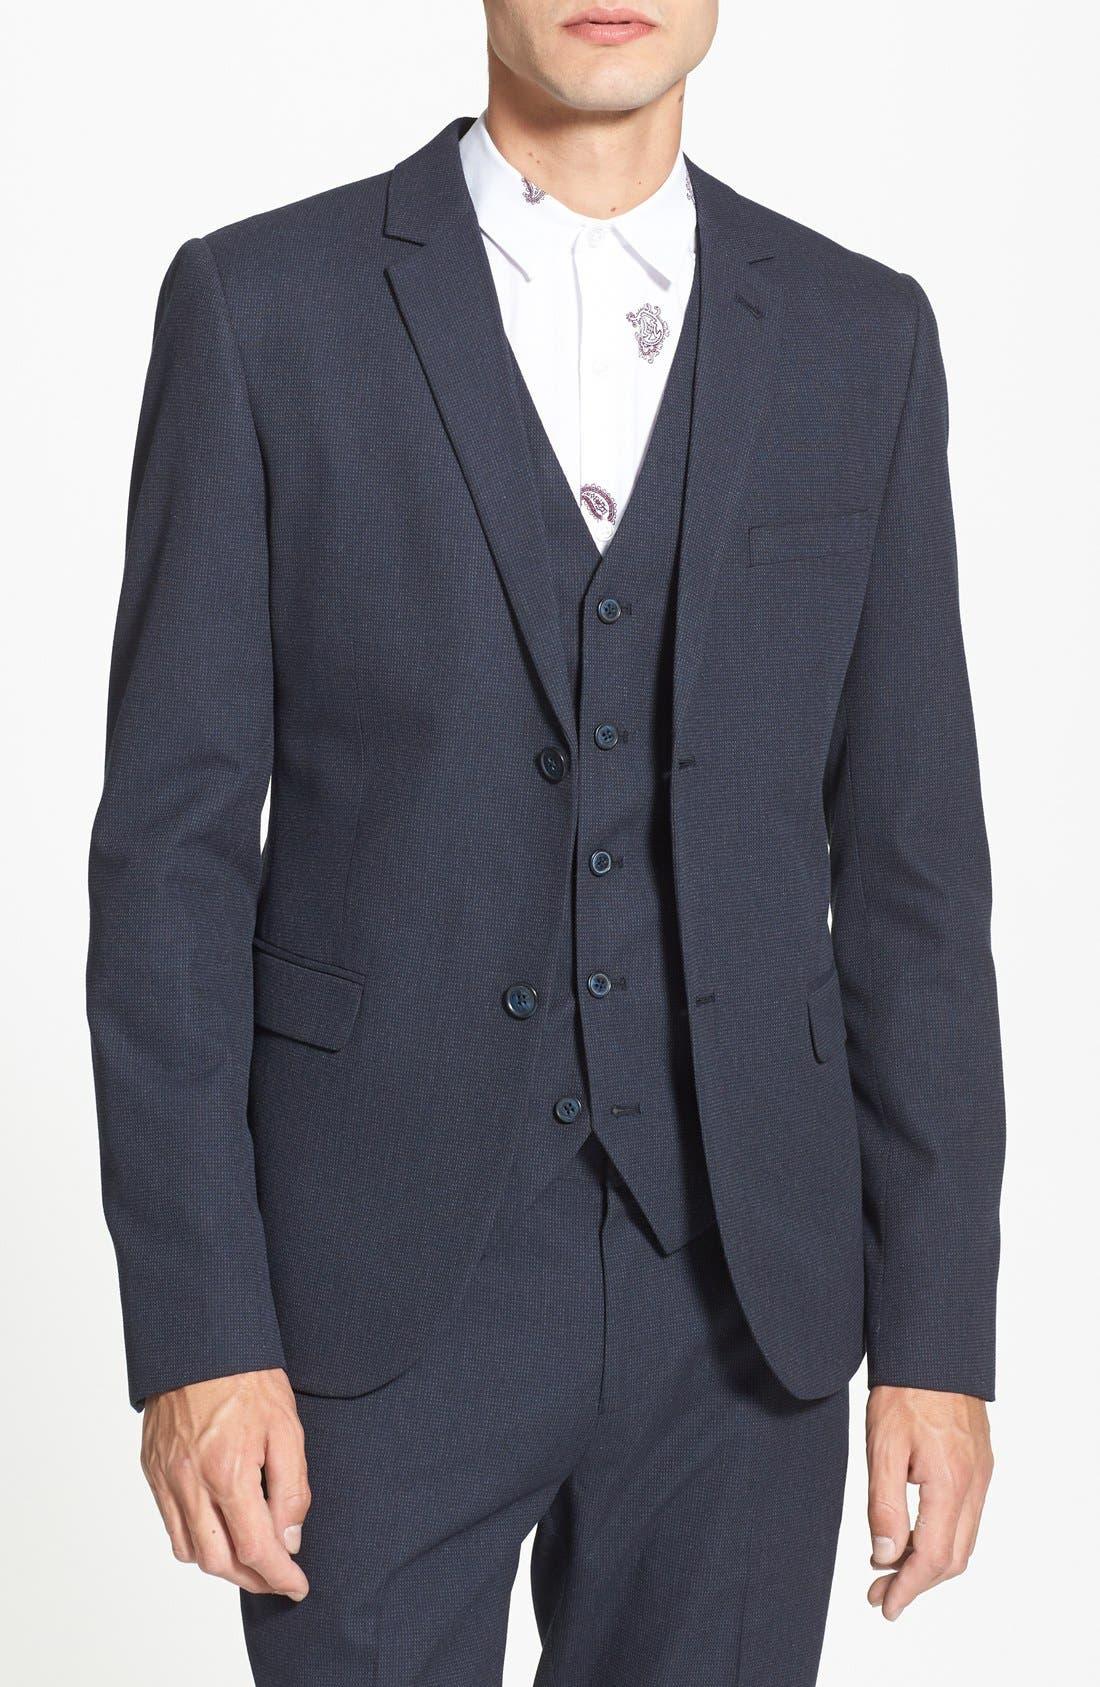 Alternate Image 1 Selected - Topman Navy Pin Dot Skinny Fit Suit Jacket